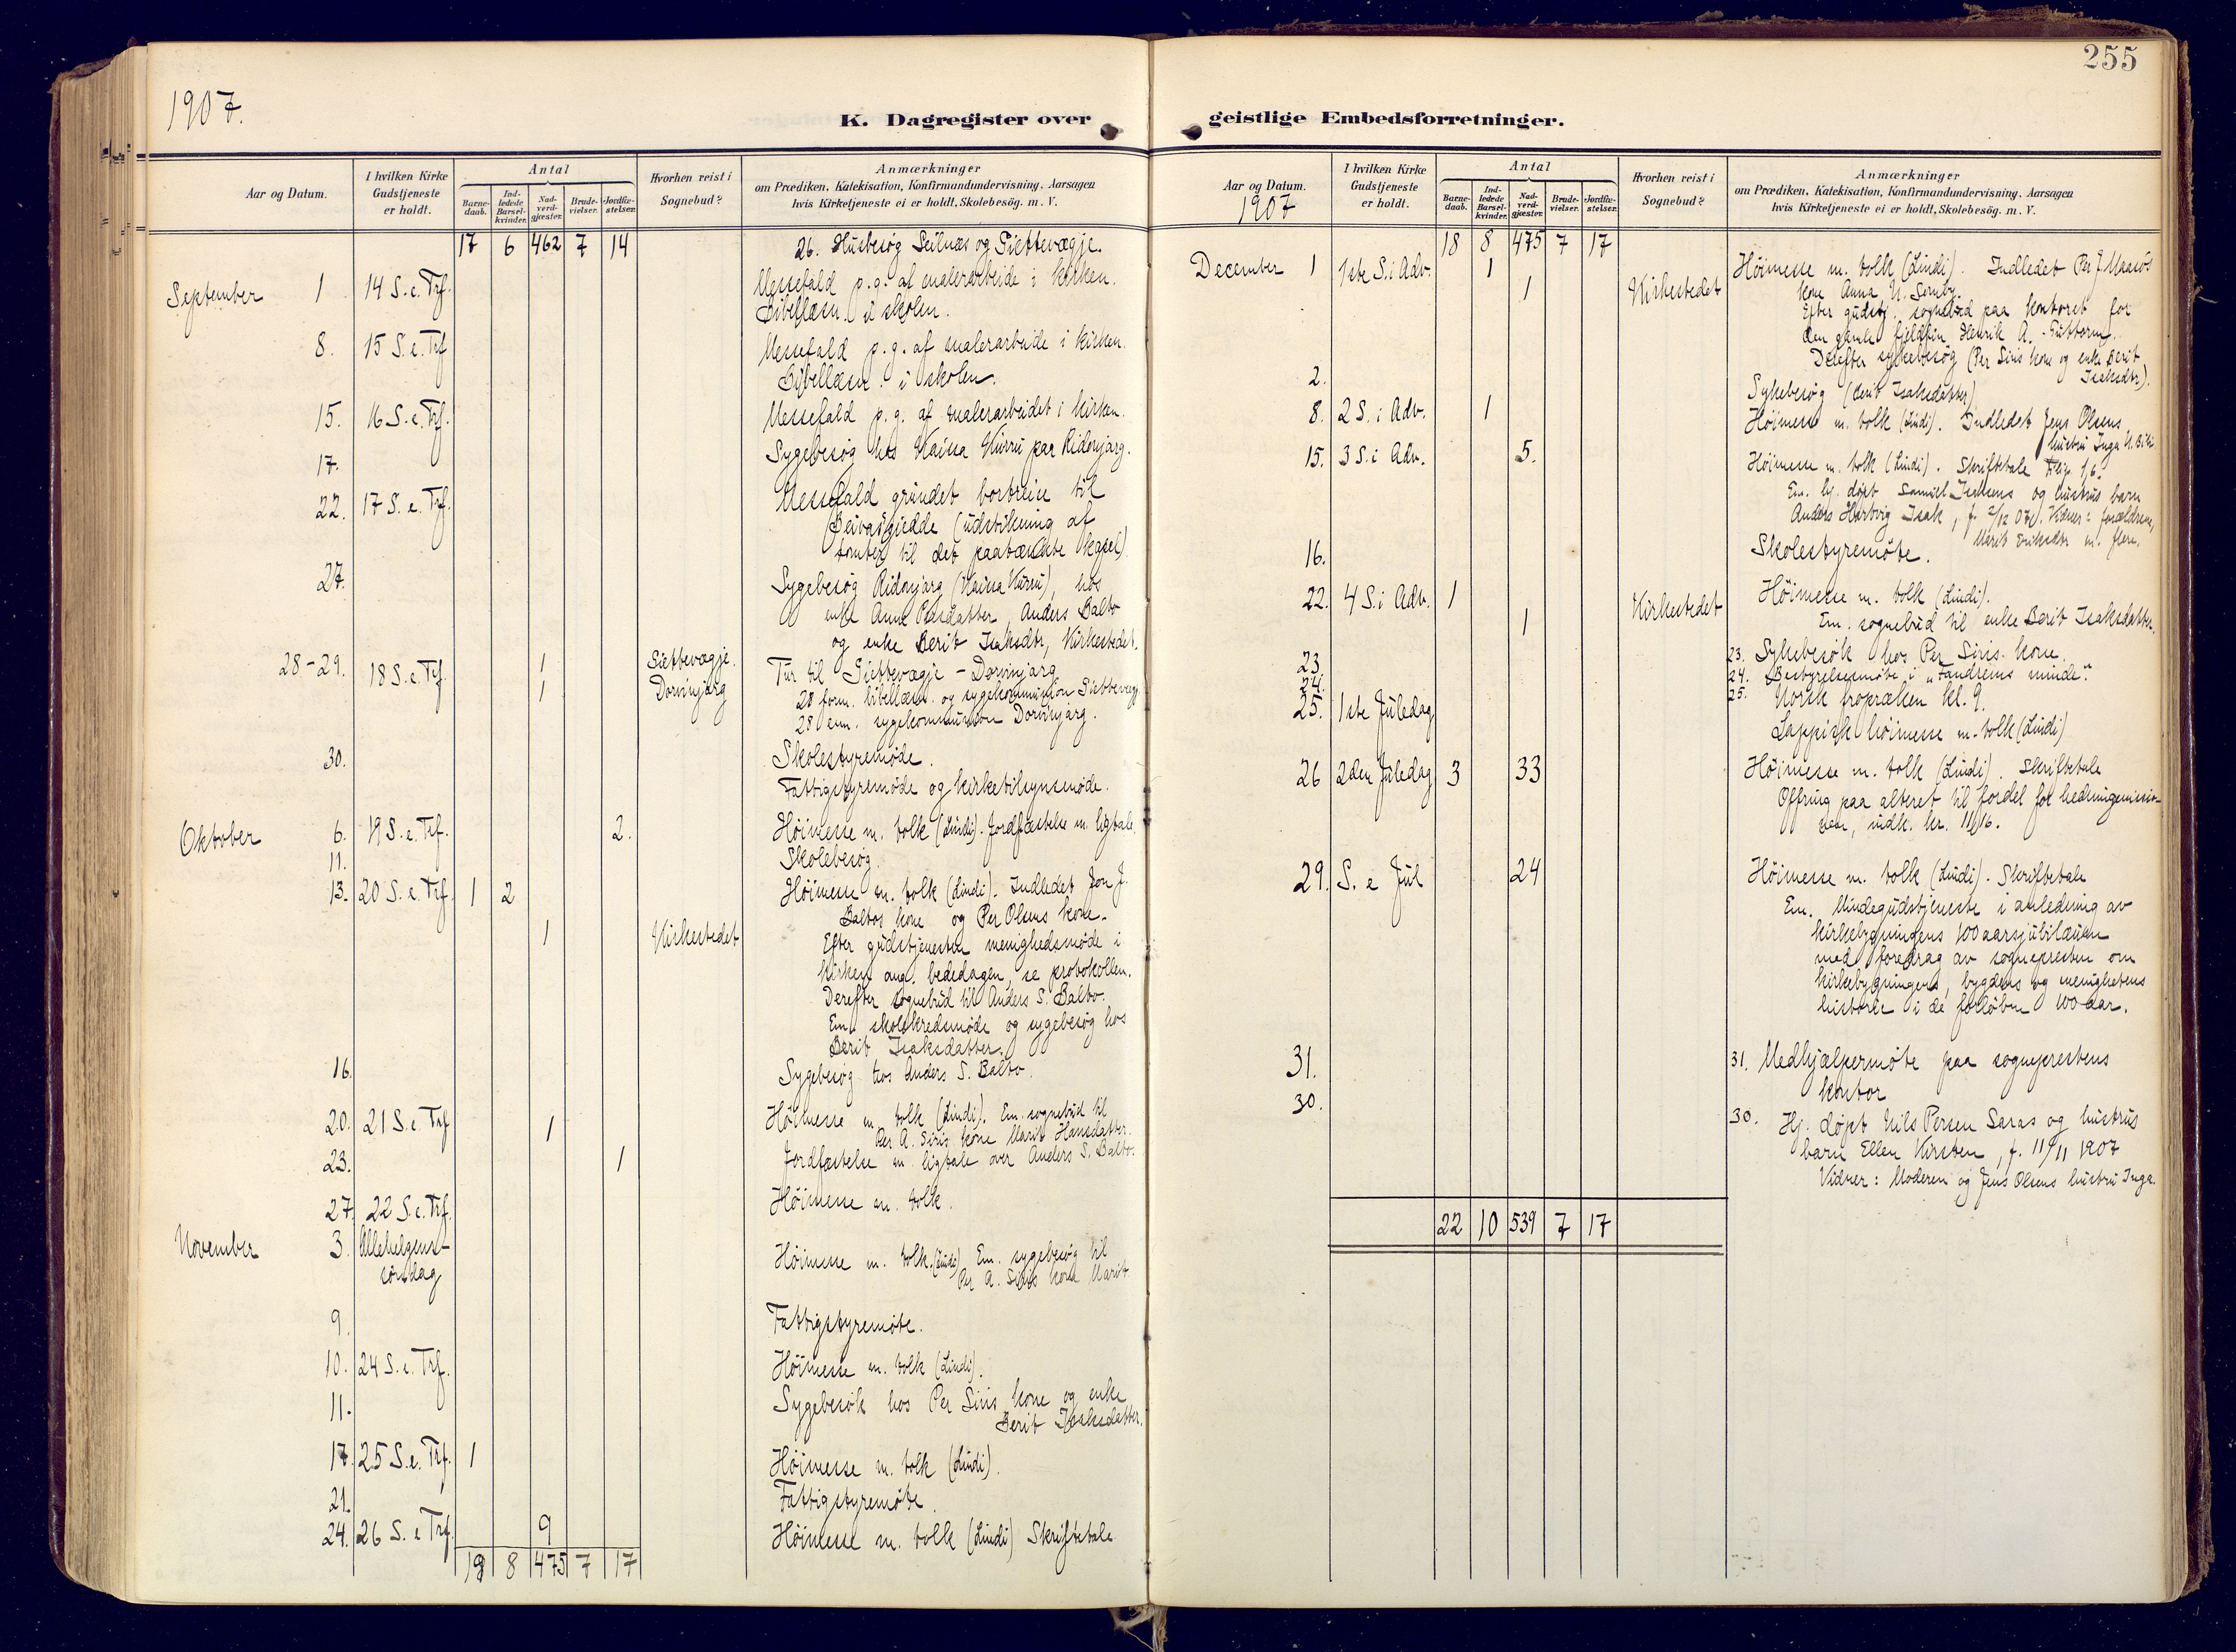 SATØ, Karasjok sokneprestkontor, H/Ha: Ministerialbok nr. 3, 1907-1926, s. 255